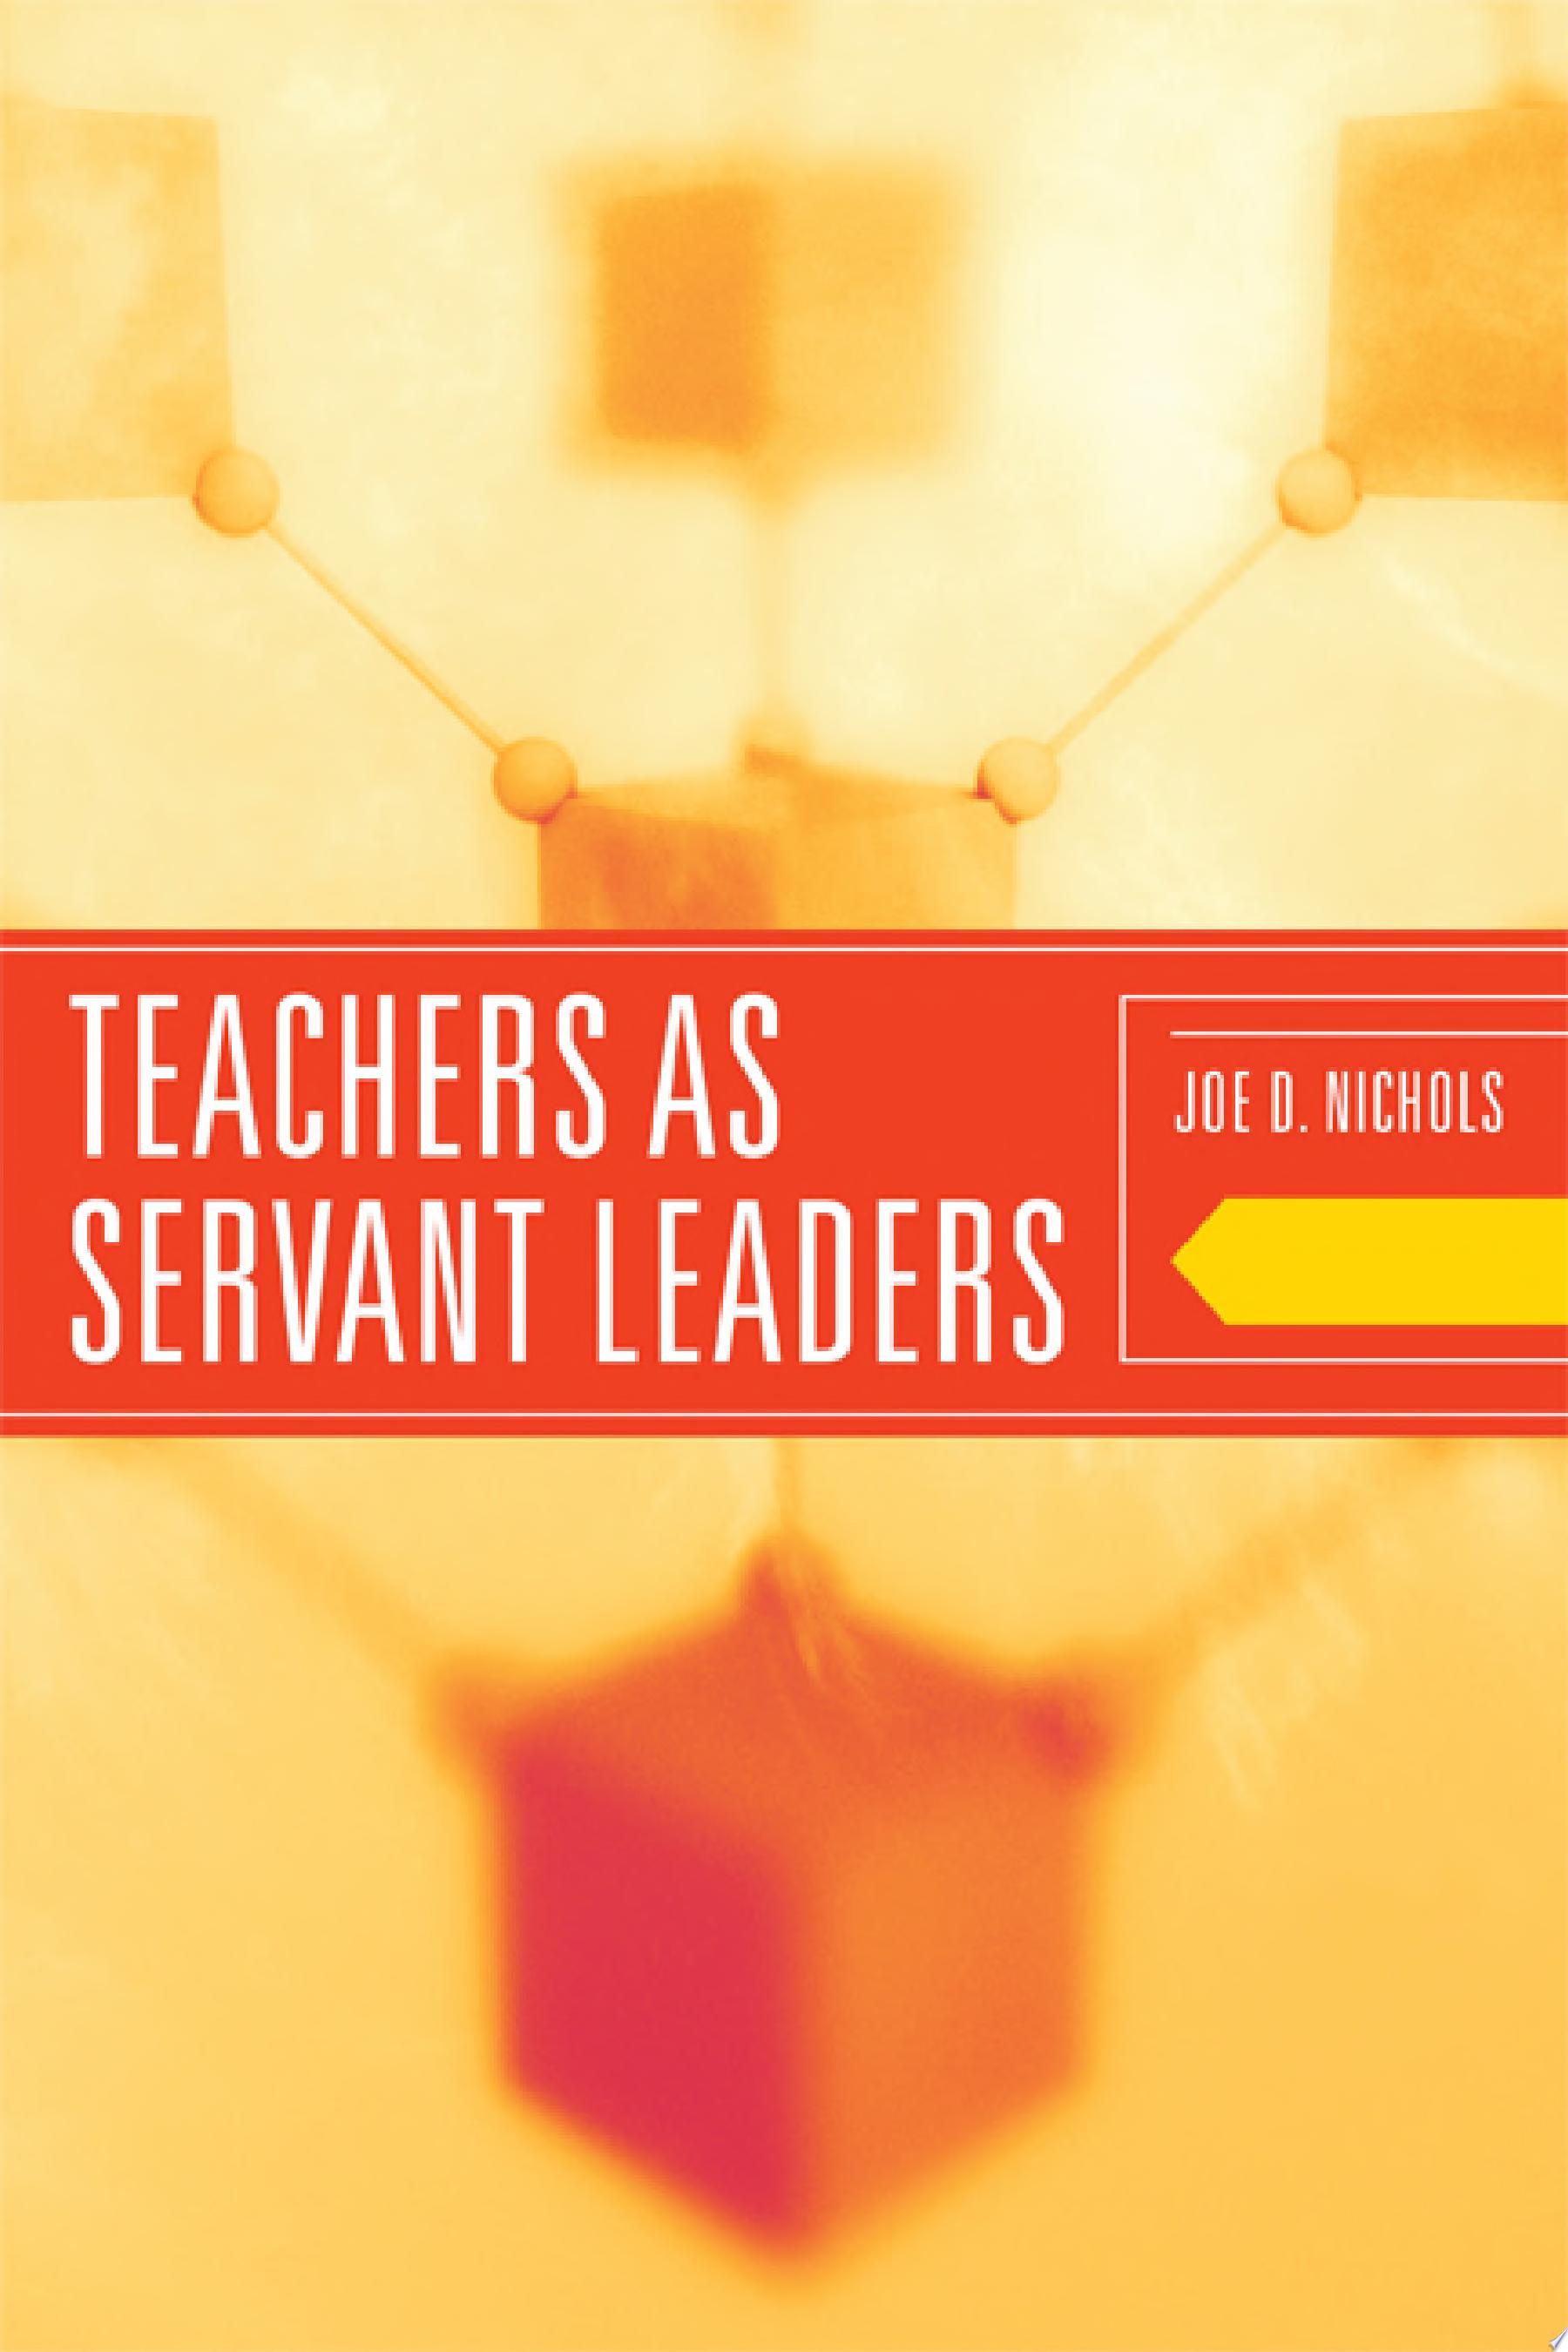 Teachers as Servant Leaders